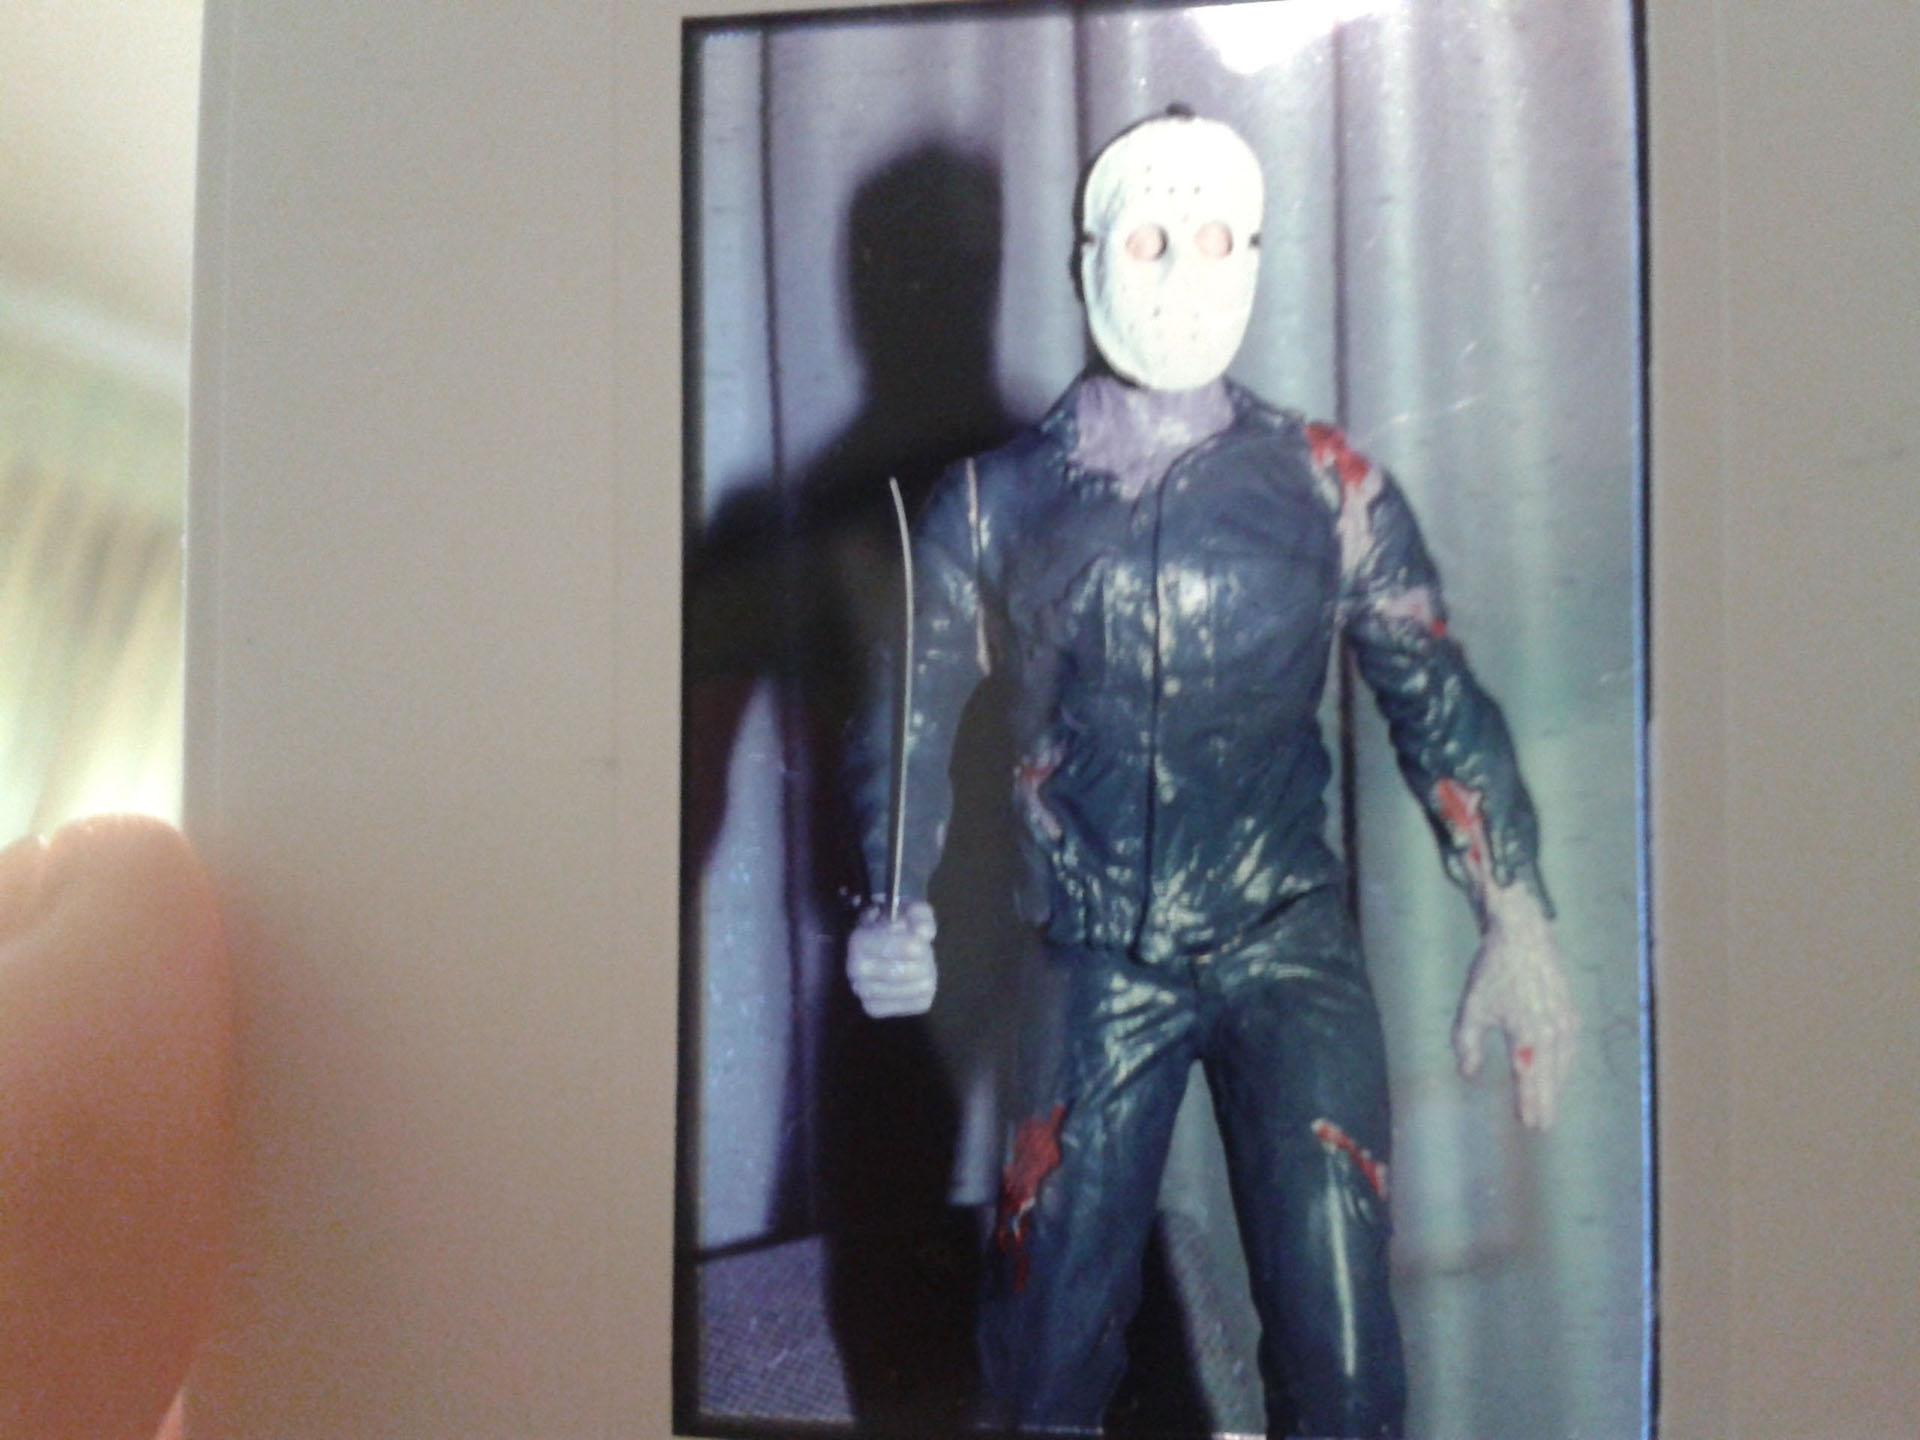 Screamin' Jason - Friday The 13th Model Kit - 1988